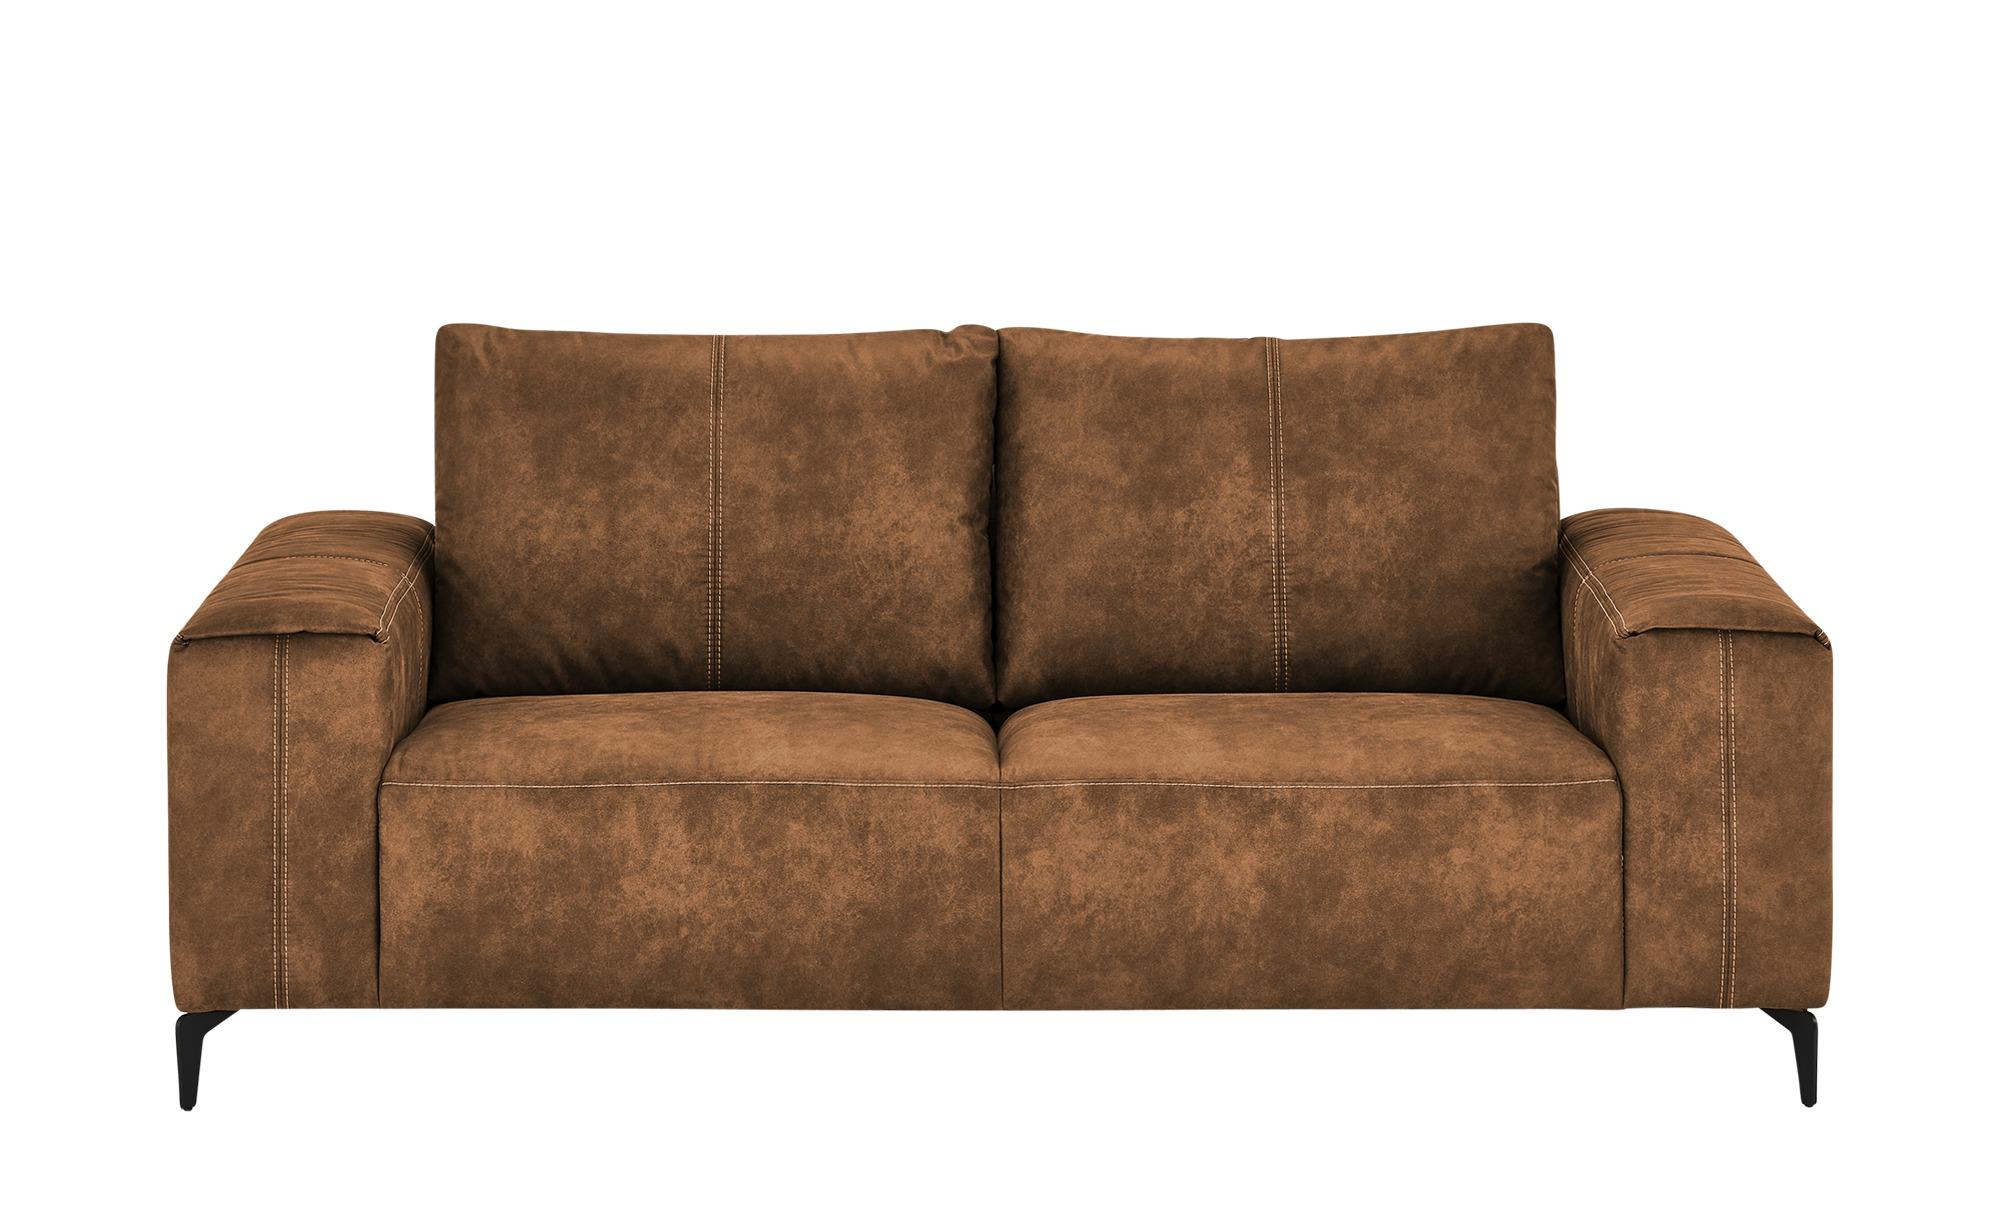 smart Sofa  Gabriela ¦ braun ¦ Maße (cm): B: 202 H: 90 T: 91 Polstermöbel > Sofas > 2-Sitzer - Höffner